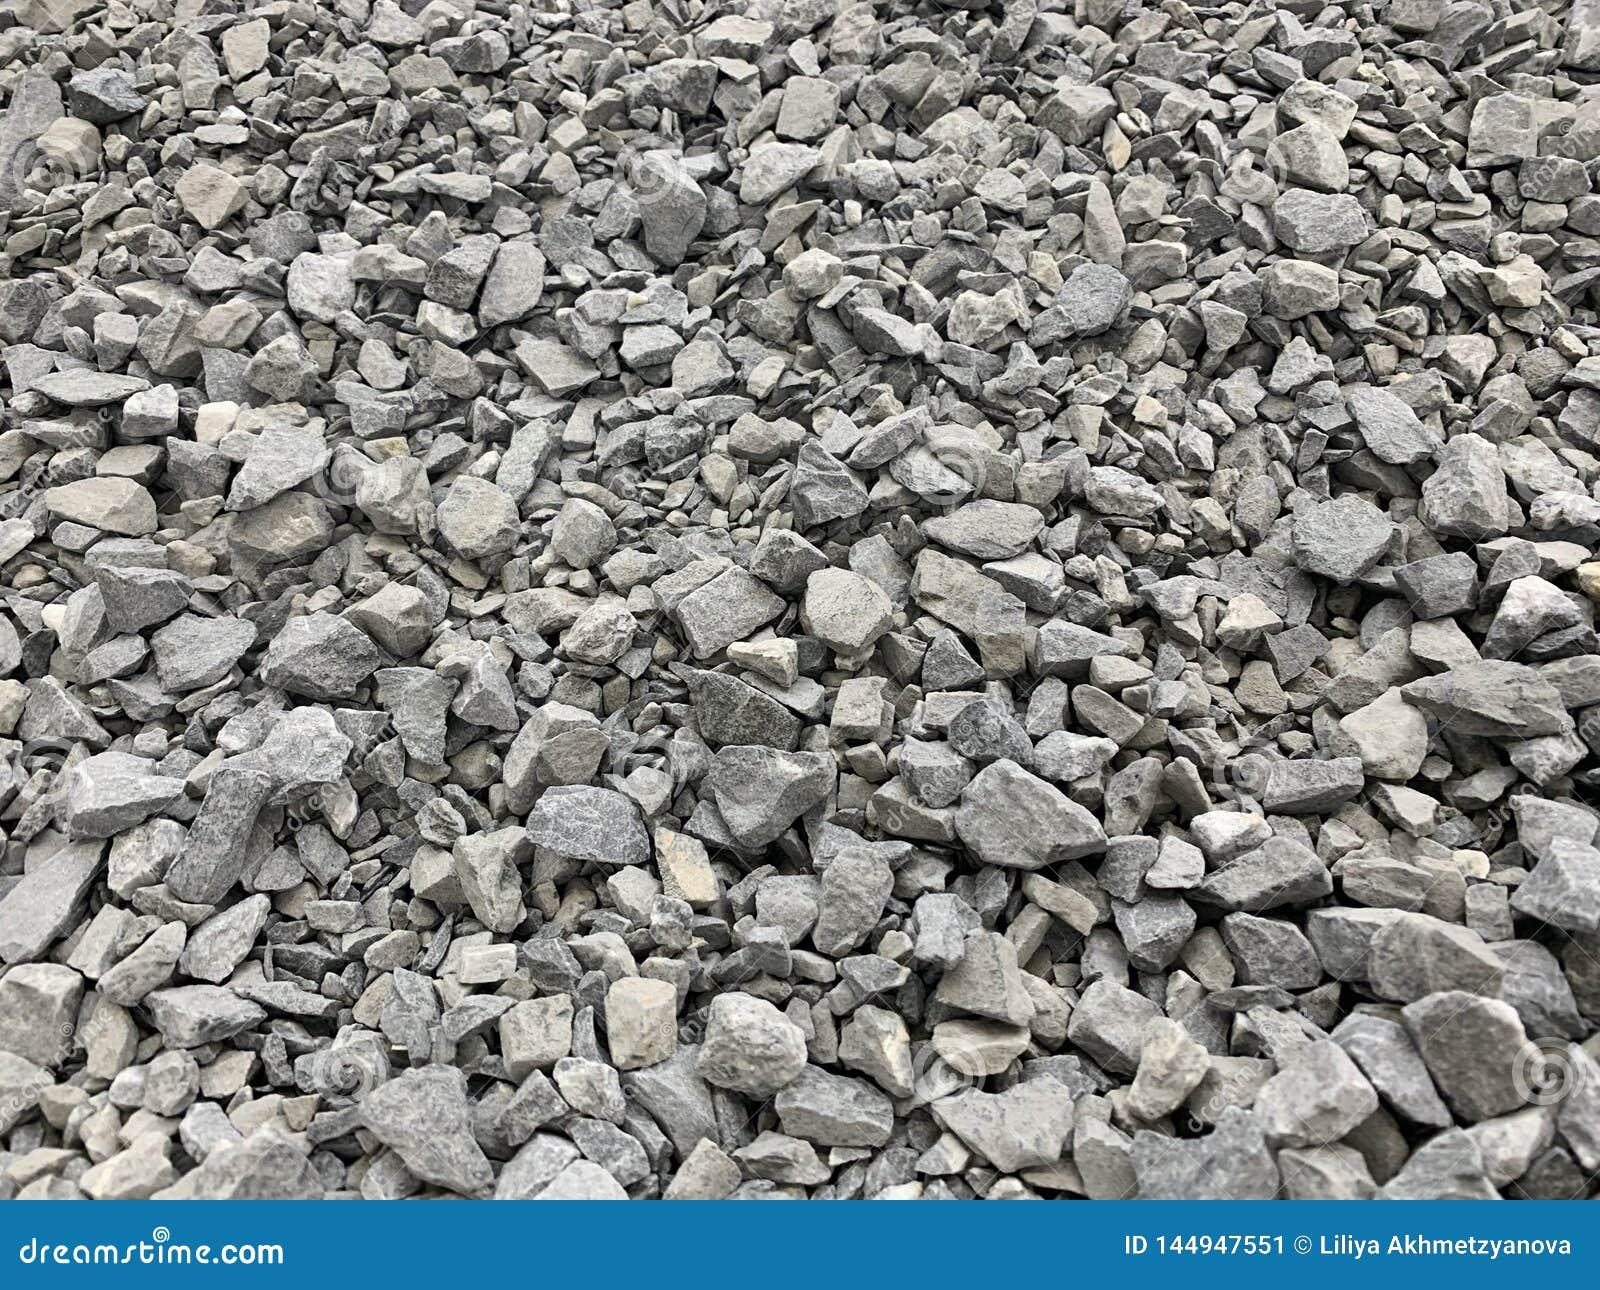 Gray small granite crumb, building material, simple background